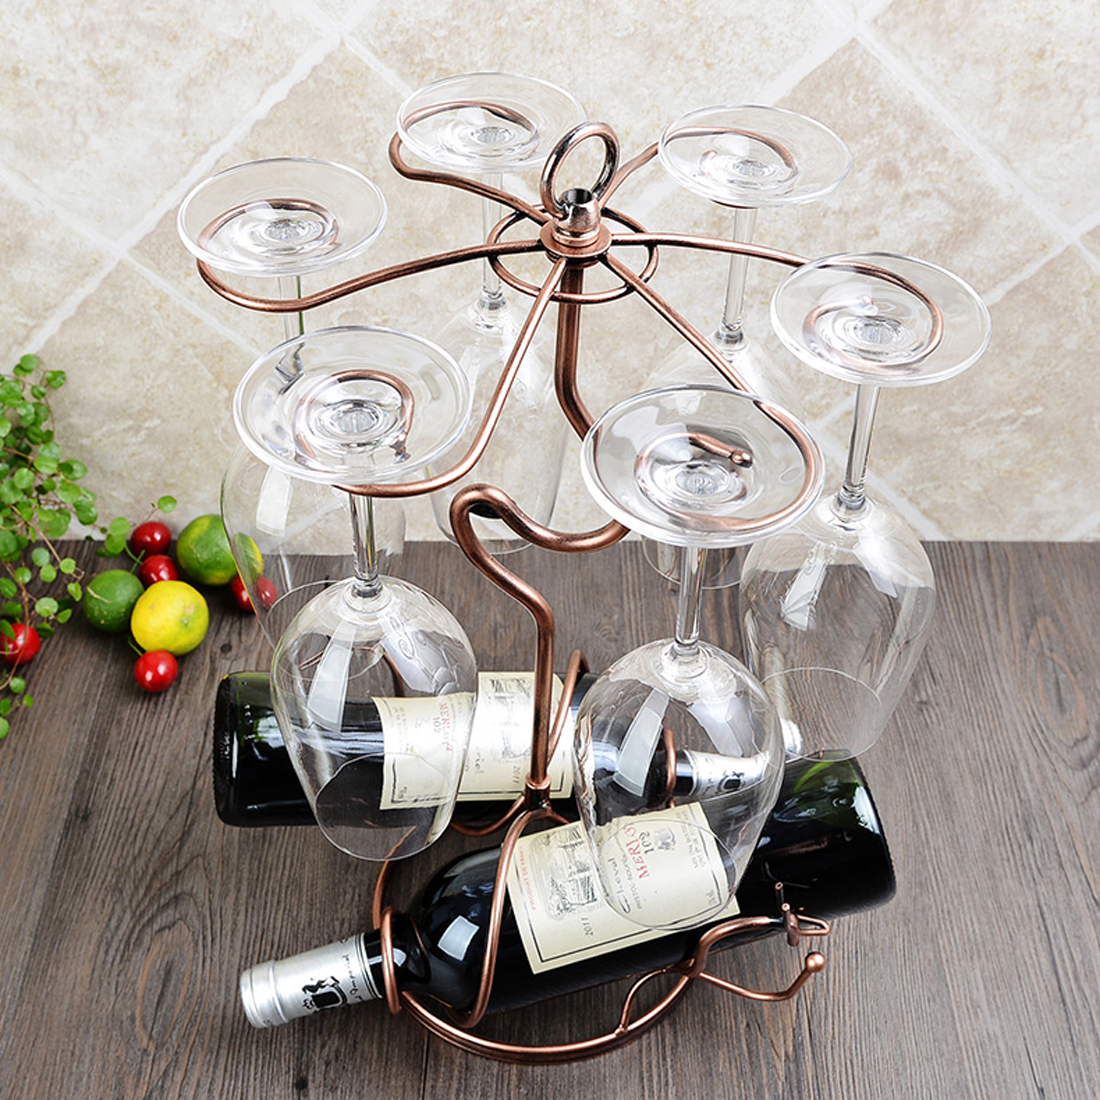 Metal Tabletop 6 Wine Glass Drying Rack Holder Display Stand 46x26cm Brass Tone 6